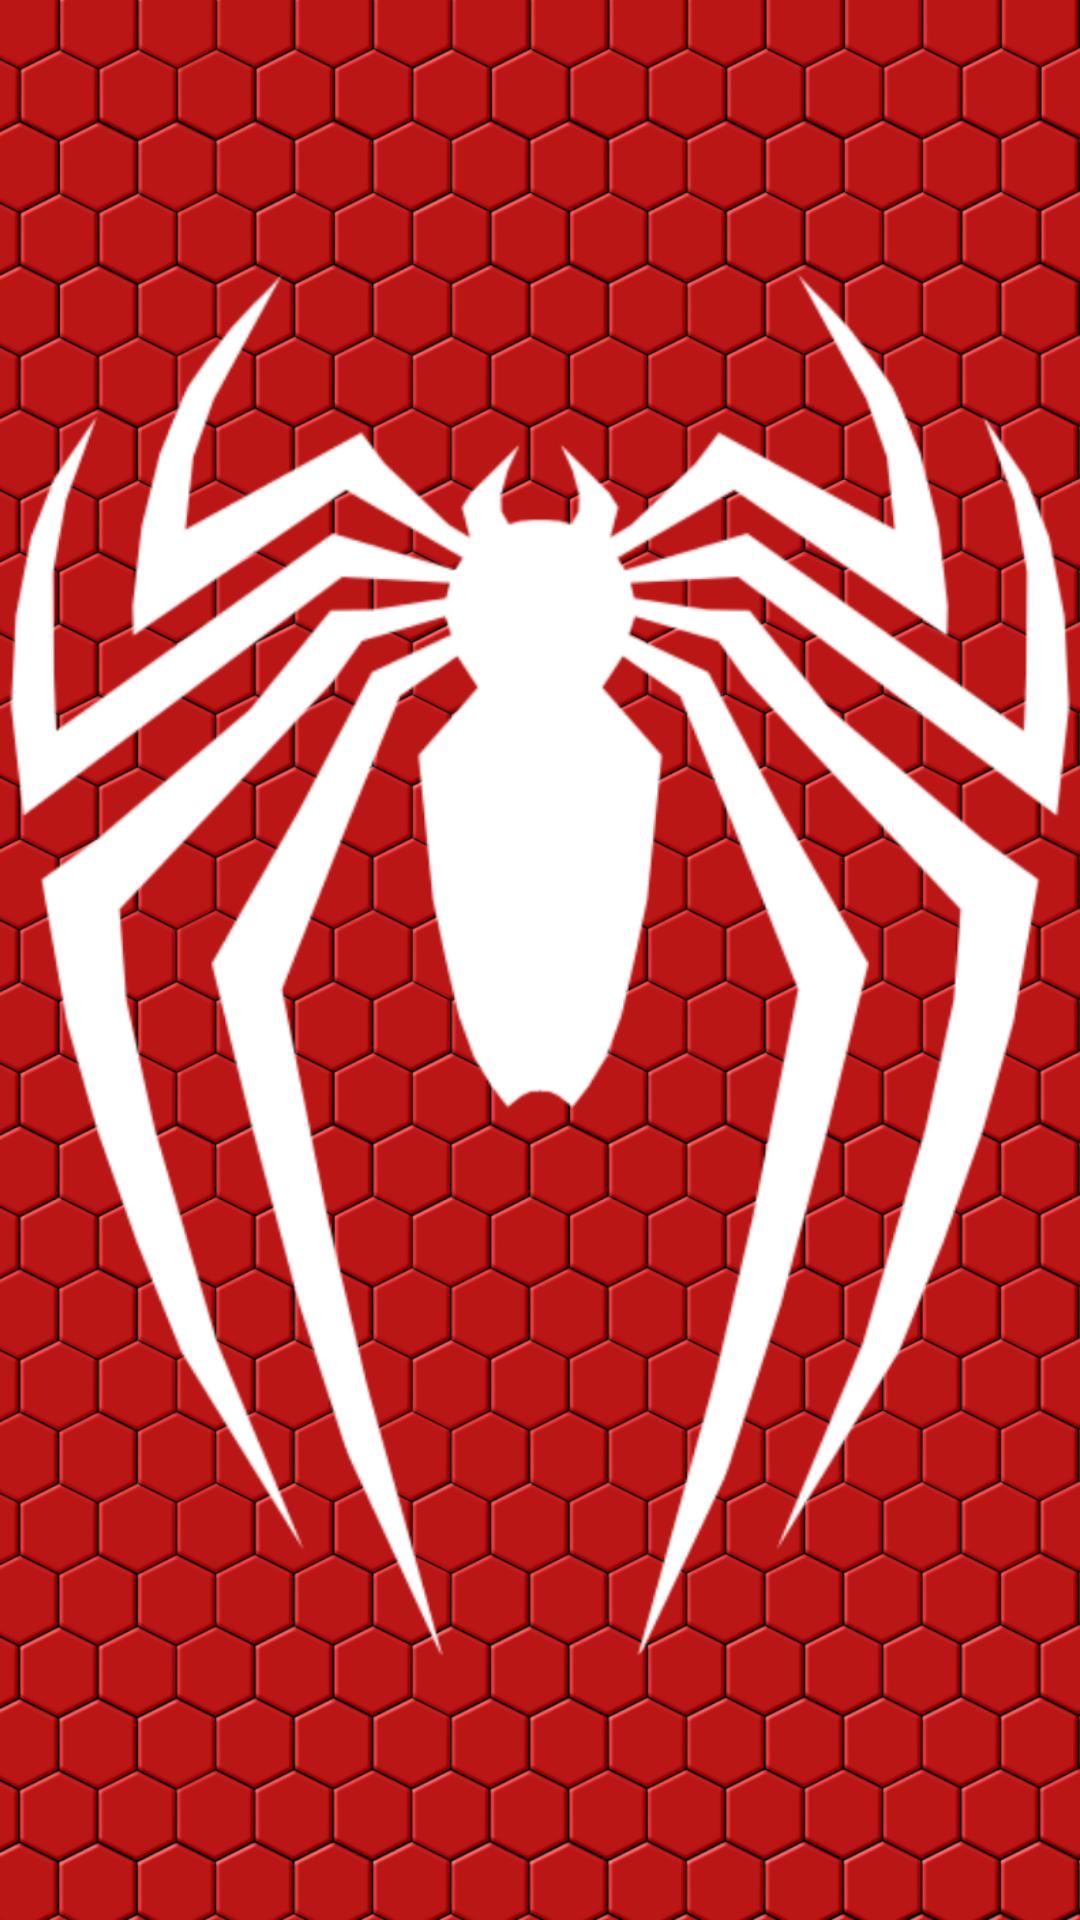 Spider Man Ps4 Logo Mobile Wallpaper By Crillyboy25 On Deviantart